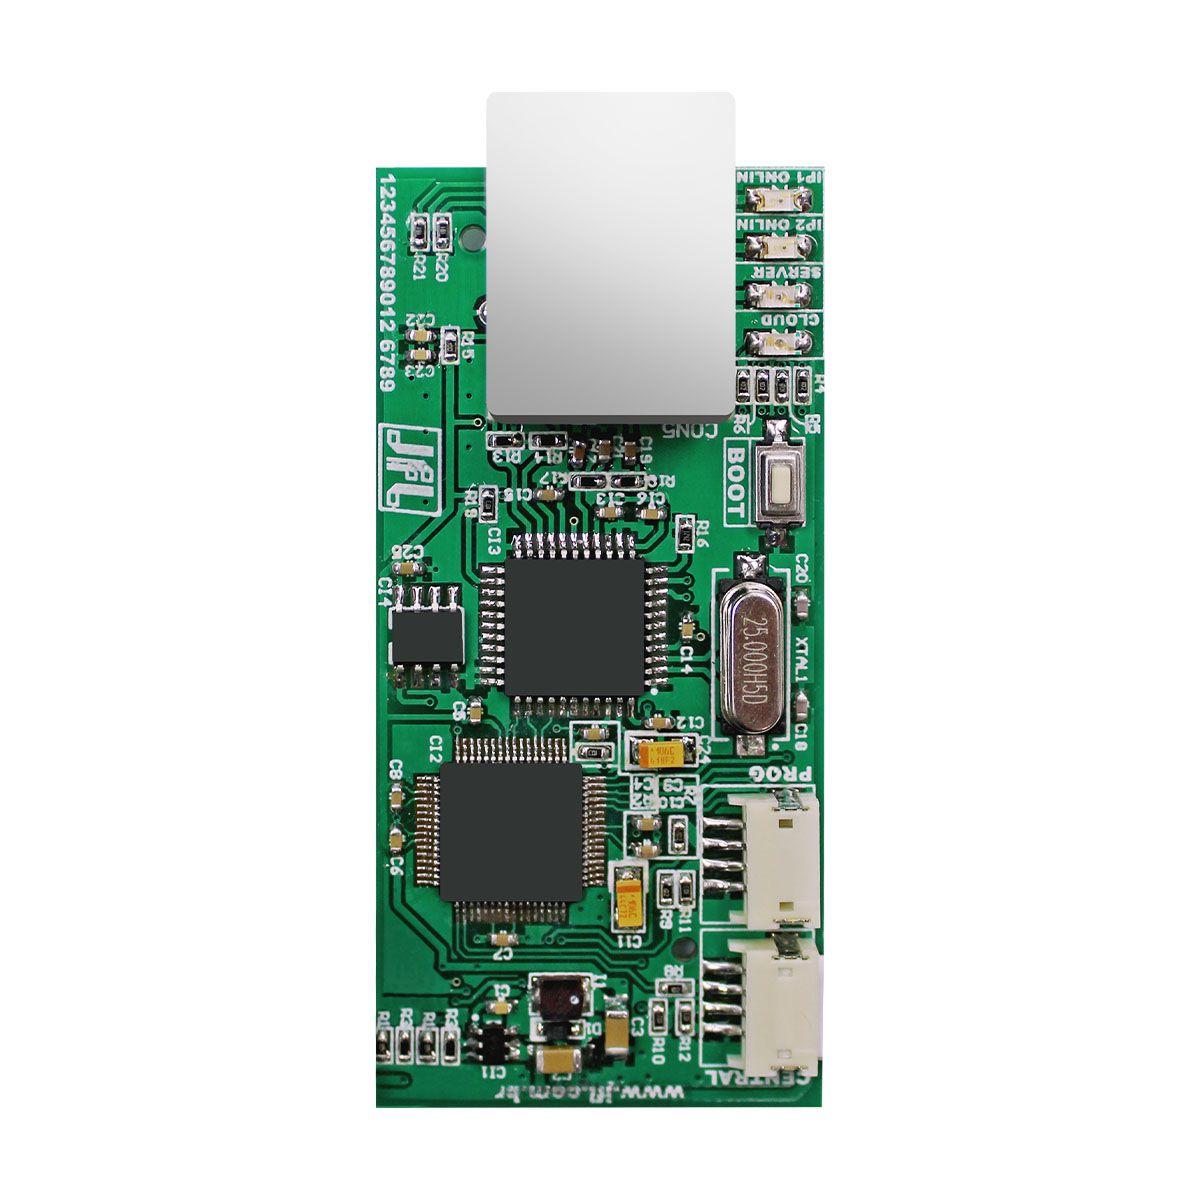 Kit Alarme SmartCloud 18 Jfl 3 Sensores Shc Fit 2 Idx 1001